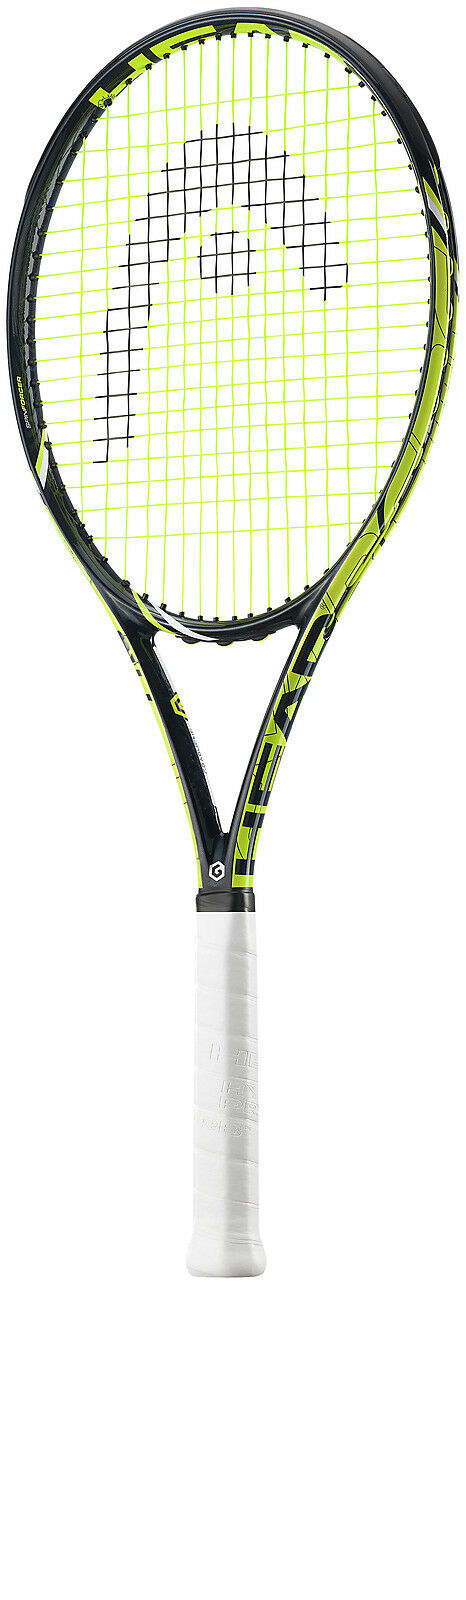 Head Graphene Extreme Mp Richard Gasquet Tenis Raqueta - 4-3 8  - reg  200